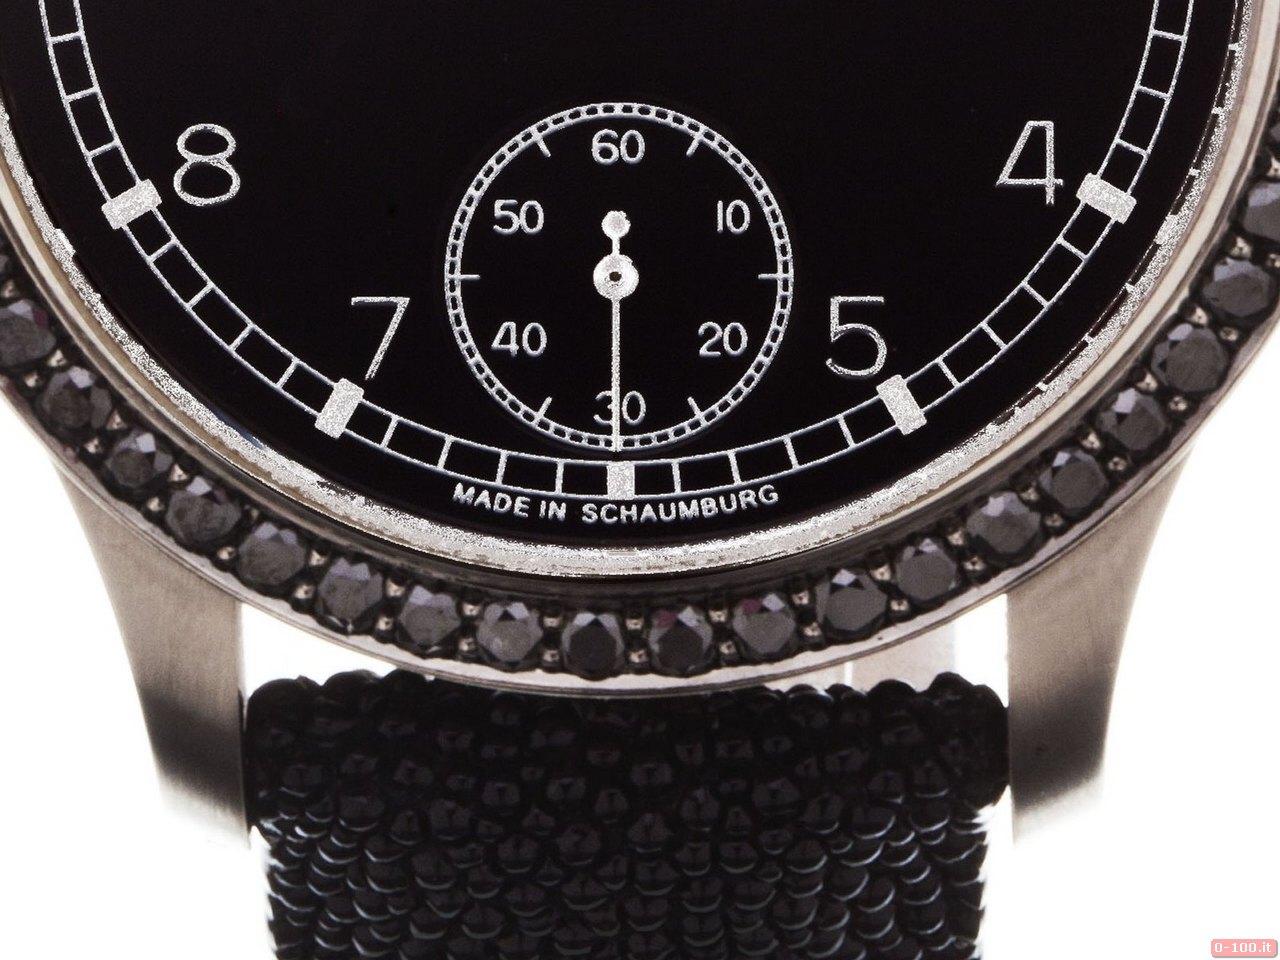 anteprima-baselworld-2013-york-royal-black-caviar_0-100 3